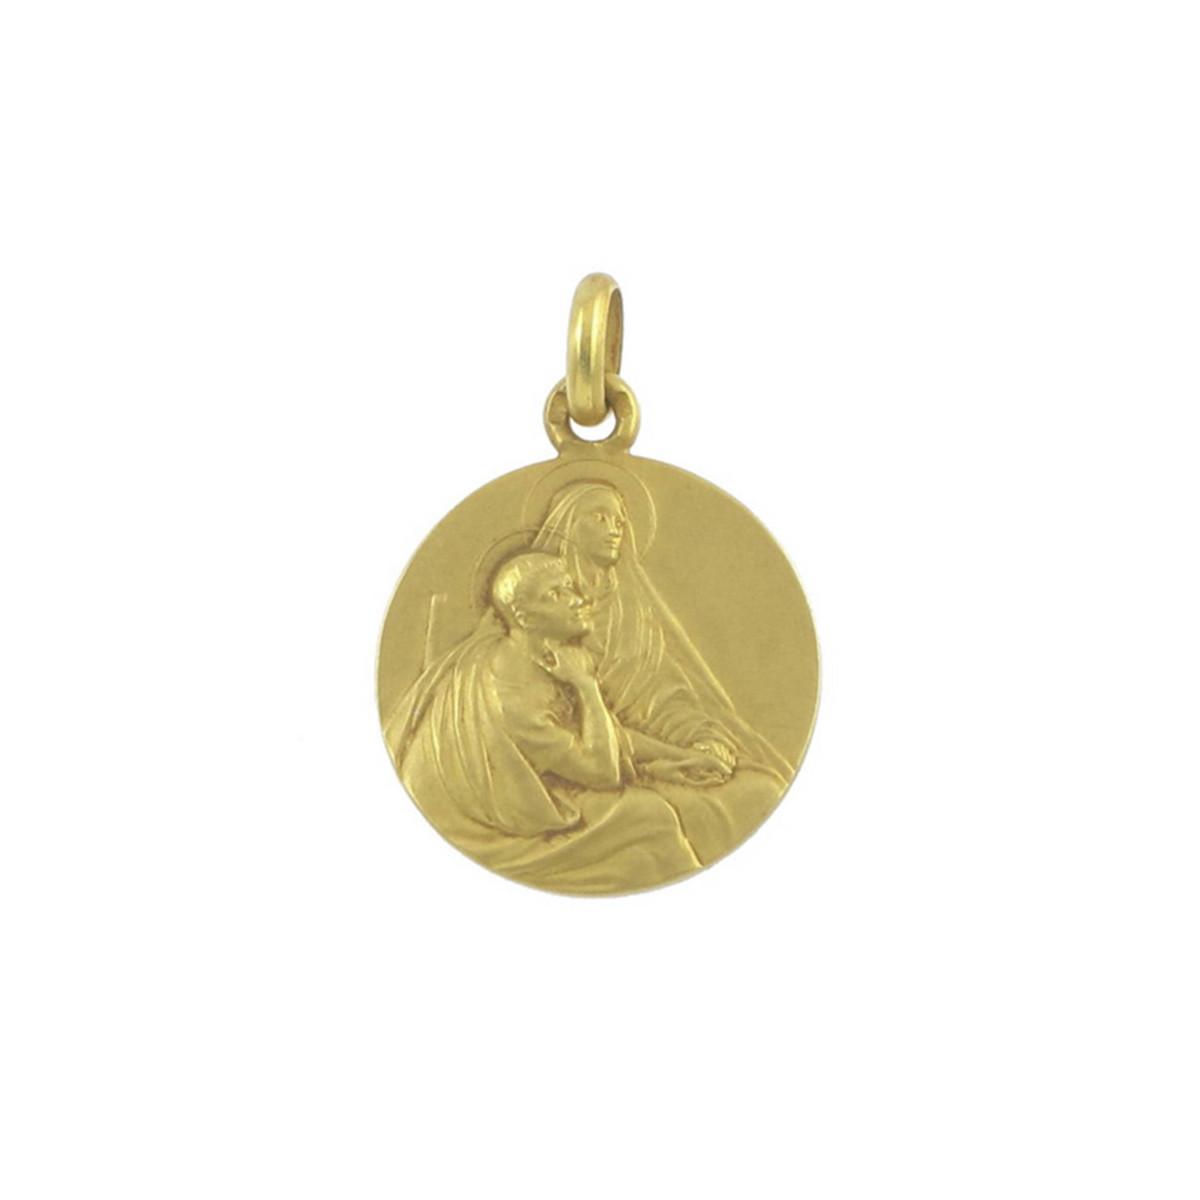 GOLD MEDAL SANTA MONICA